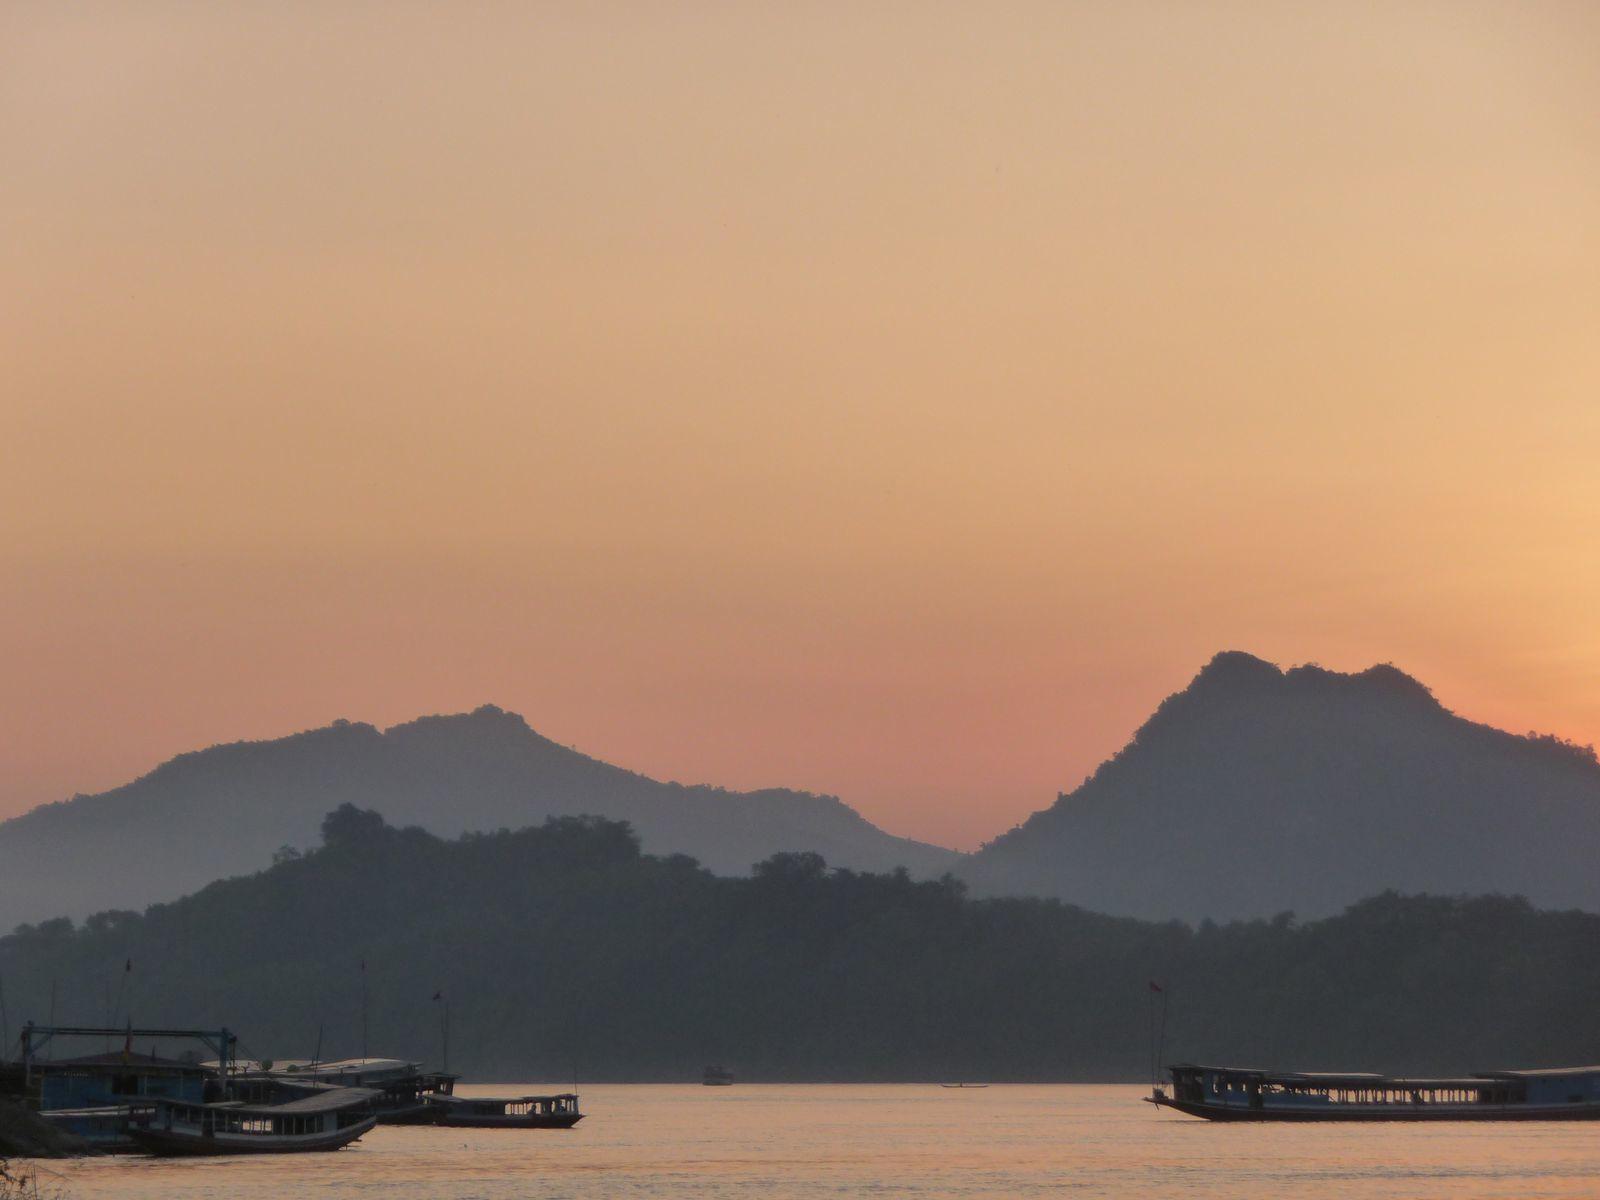 Luang Prabang, élégante cité du Laos